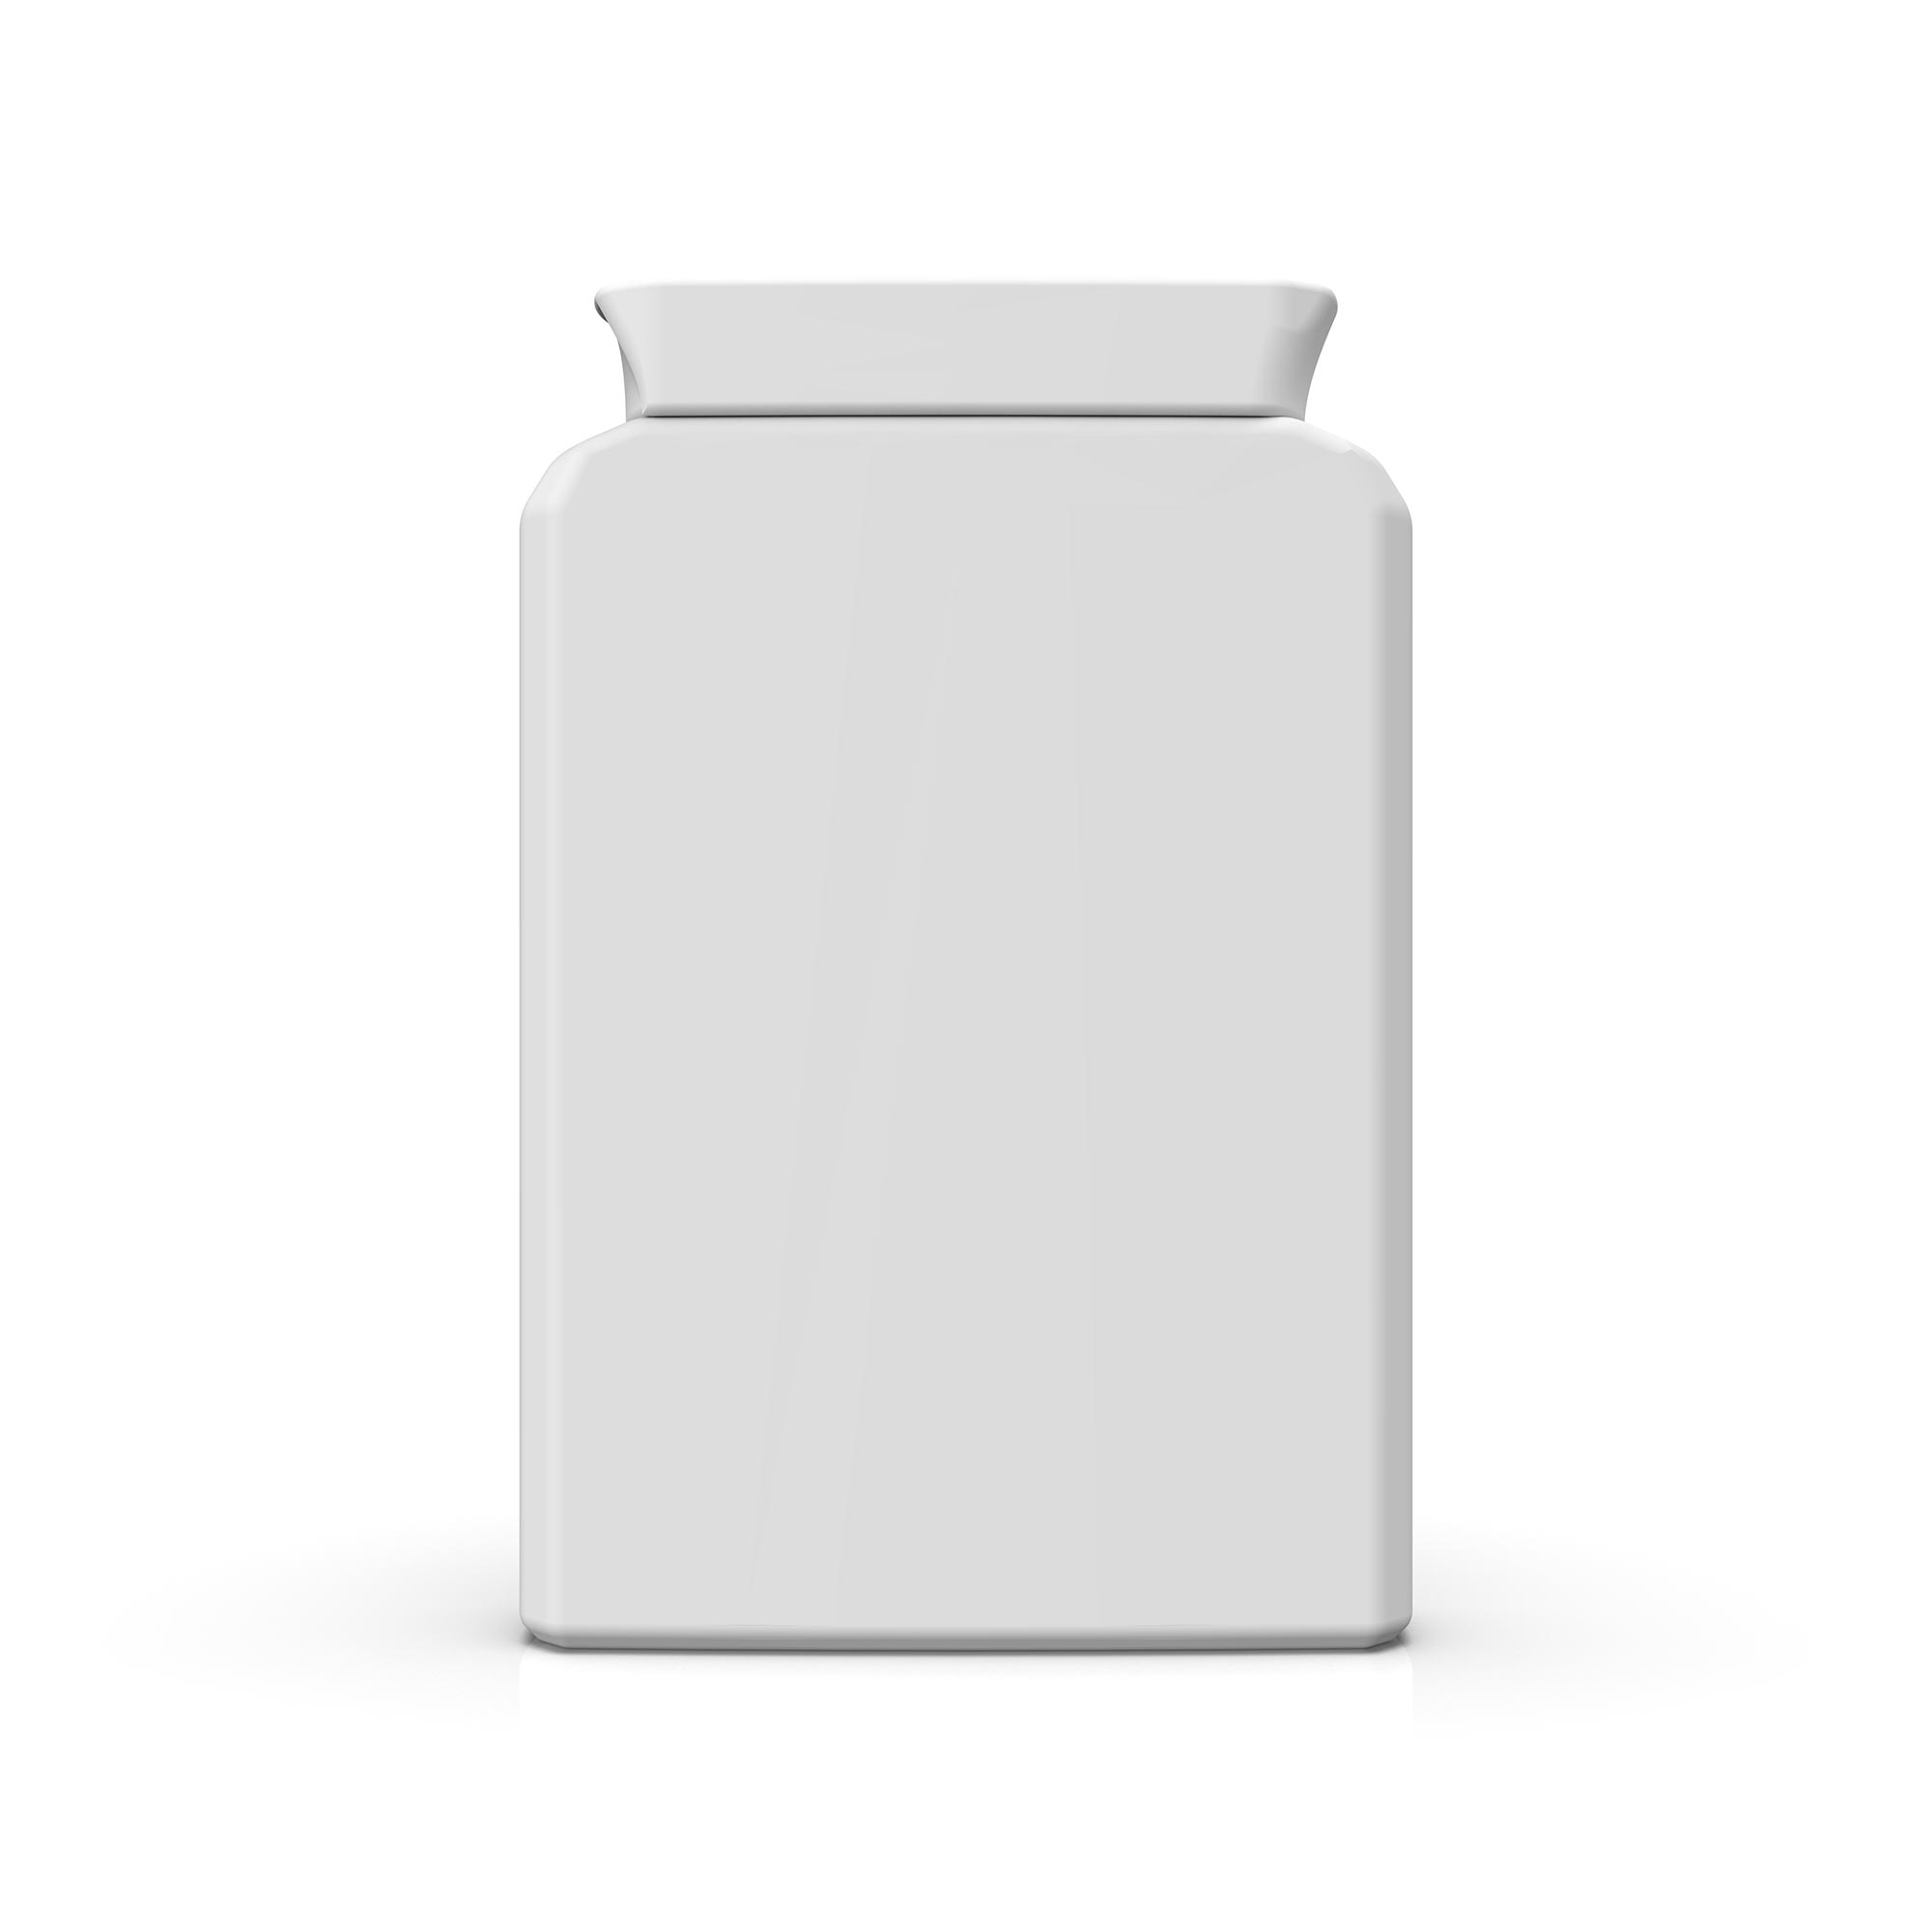 Kula Tub Grey Card